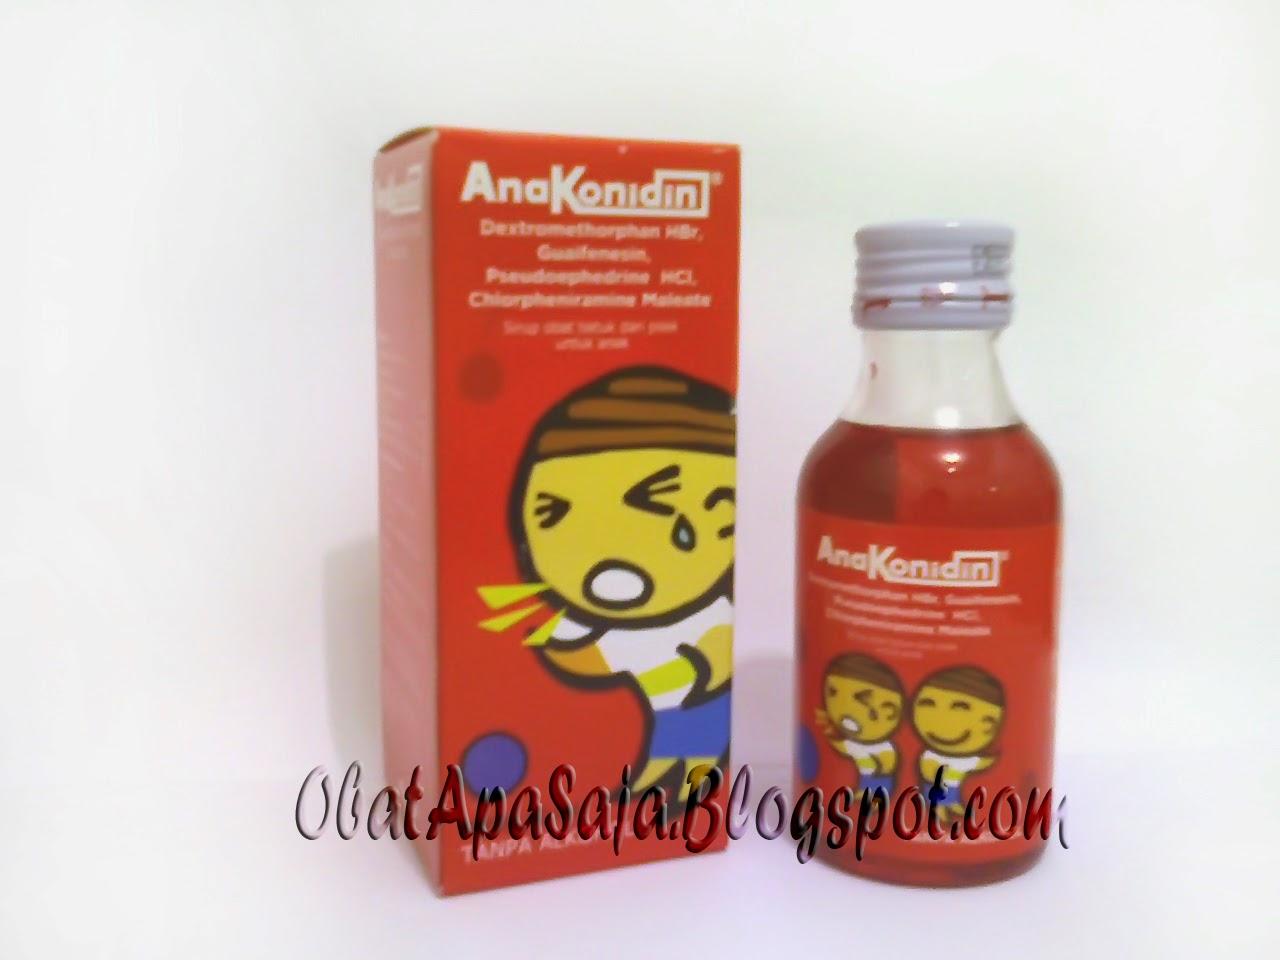 Anakonidin Obat Batuk dan Pilek untuk Anak